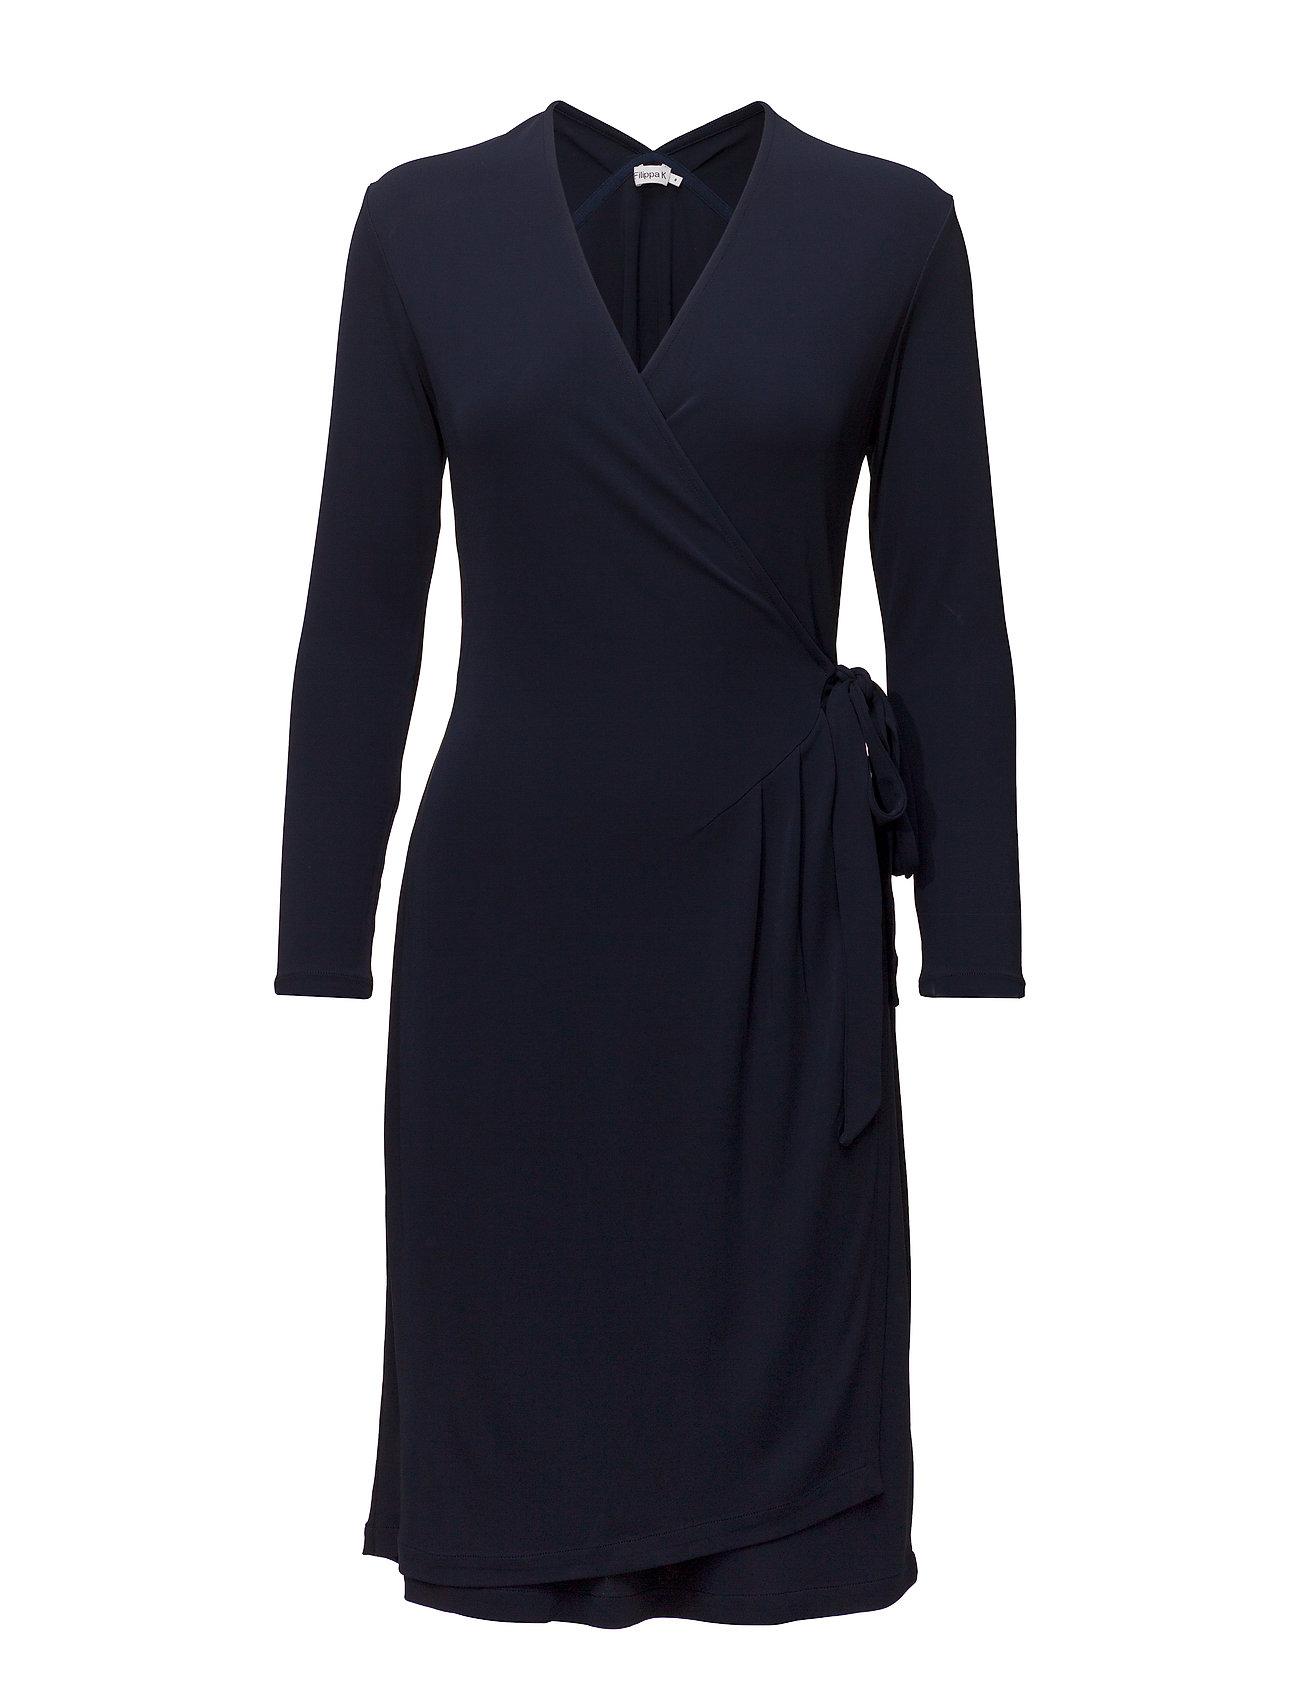 Drapey Crepe Wrap Dress (Navy) (£112.20) - Filippa K -  fd29de019b18